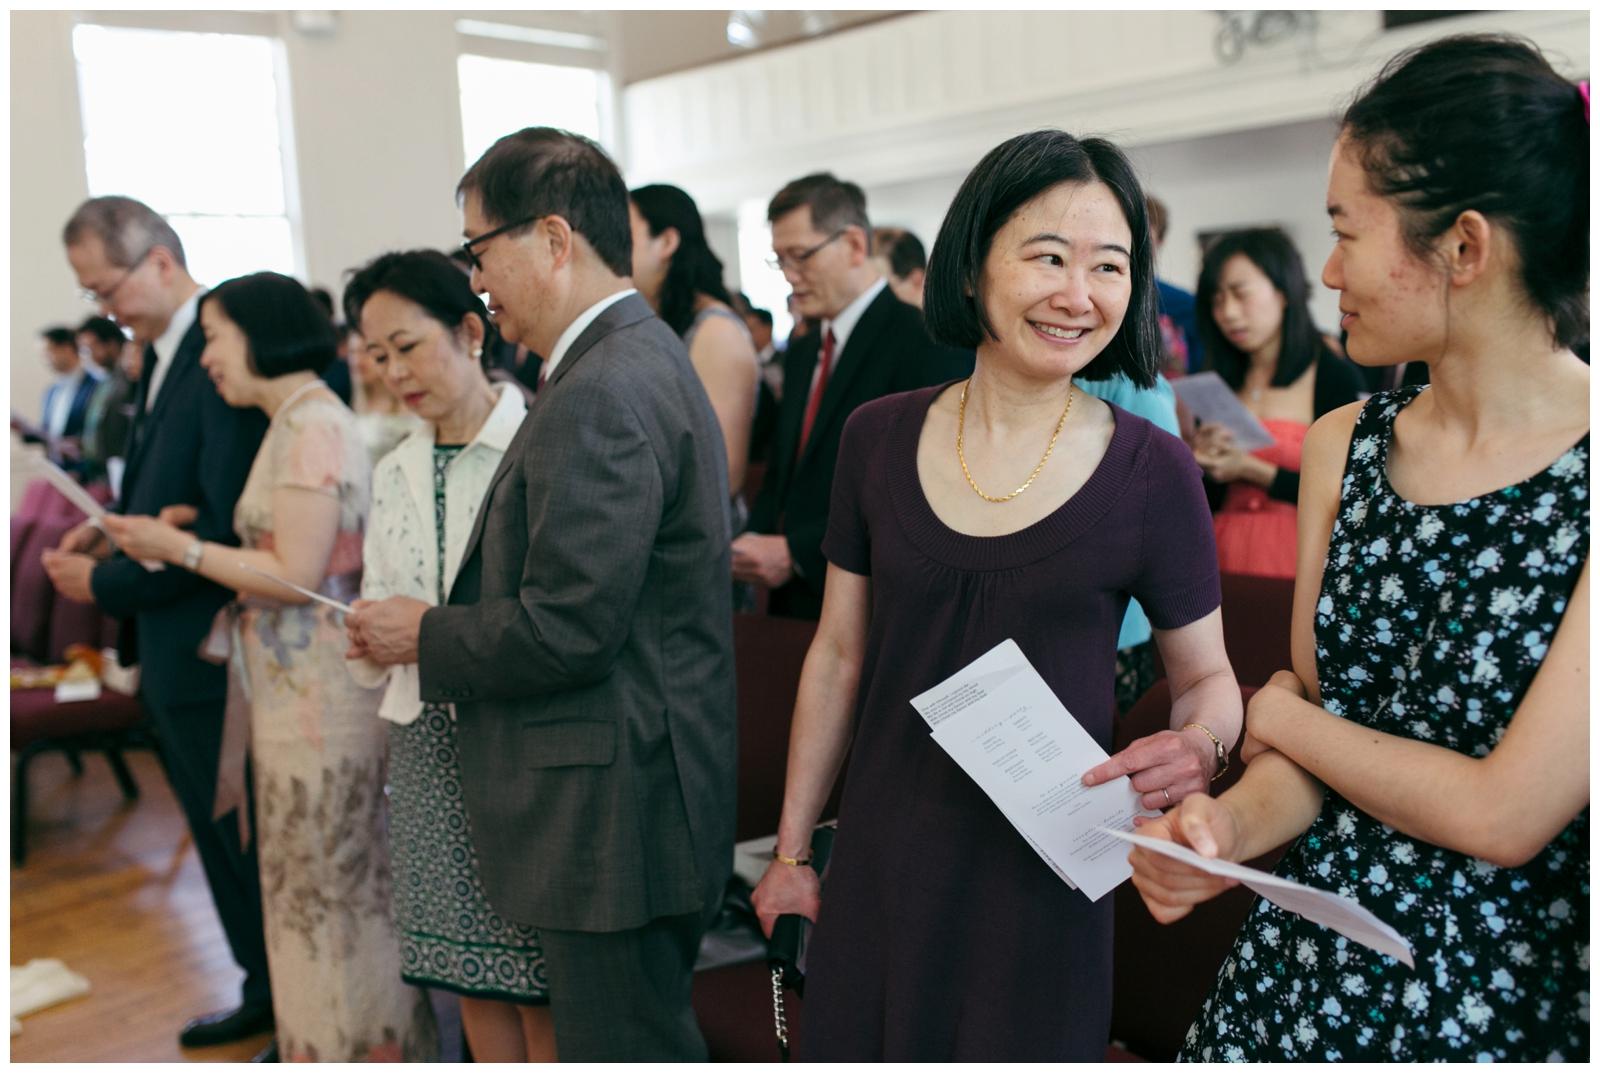 Samberg-Conference-Center-Boston-Wedding-Photographer-Bailey-Q-Photo-043.jpg